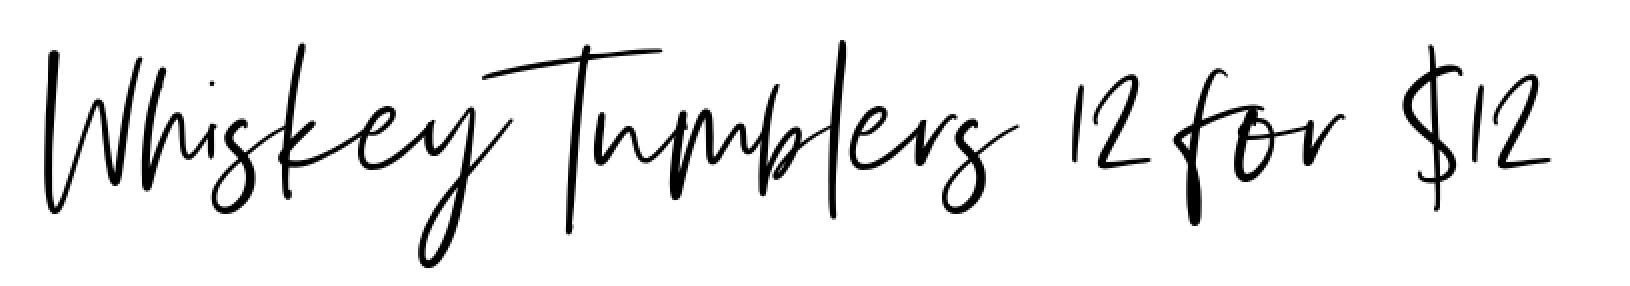 Tumblers.png